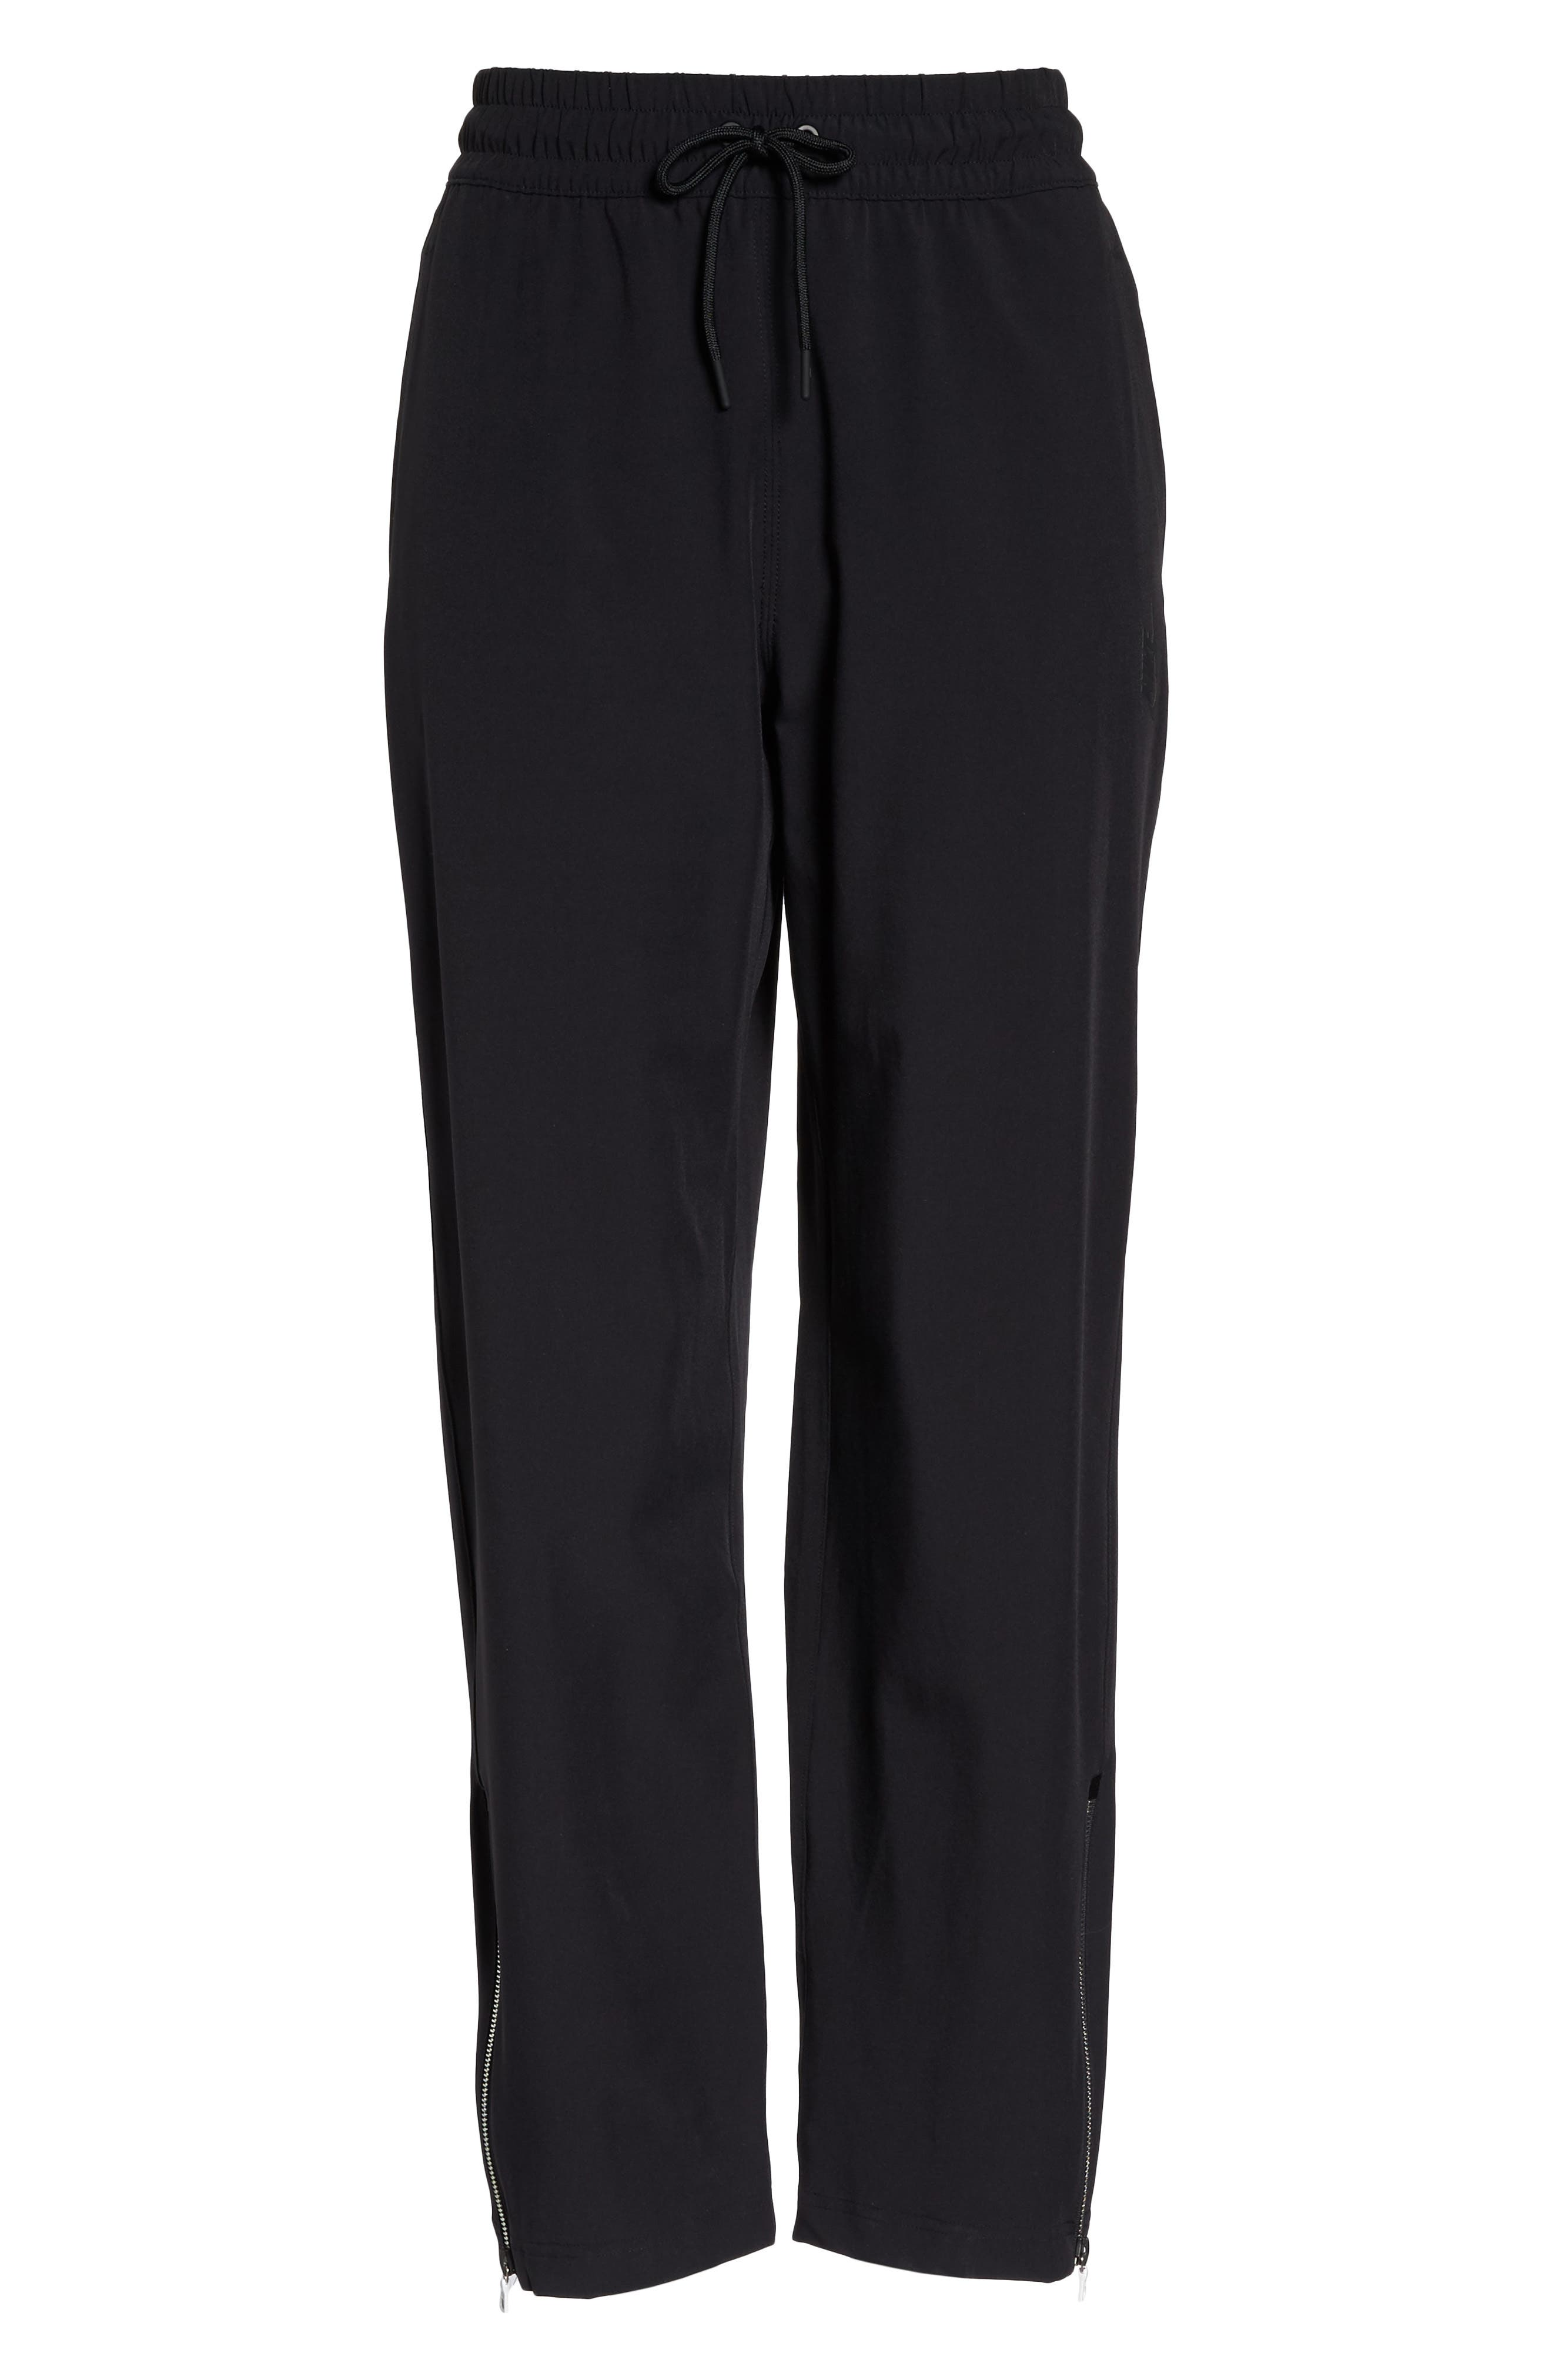 NikeLab Stretch Woven Training Pants,                             Alternate thumbnail 7, color,                             Black/ Black